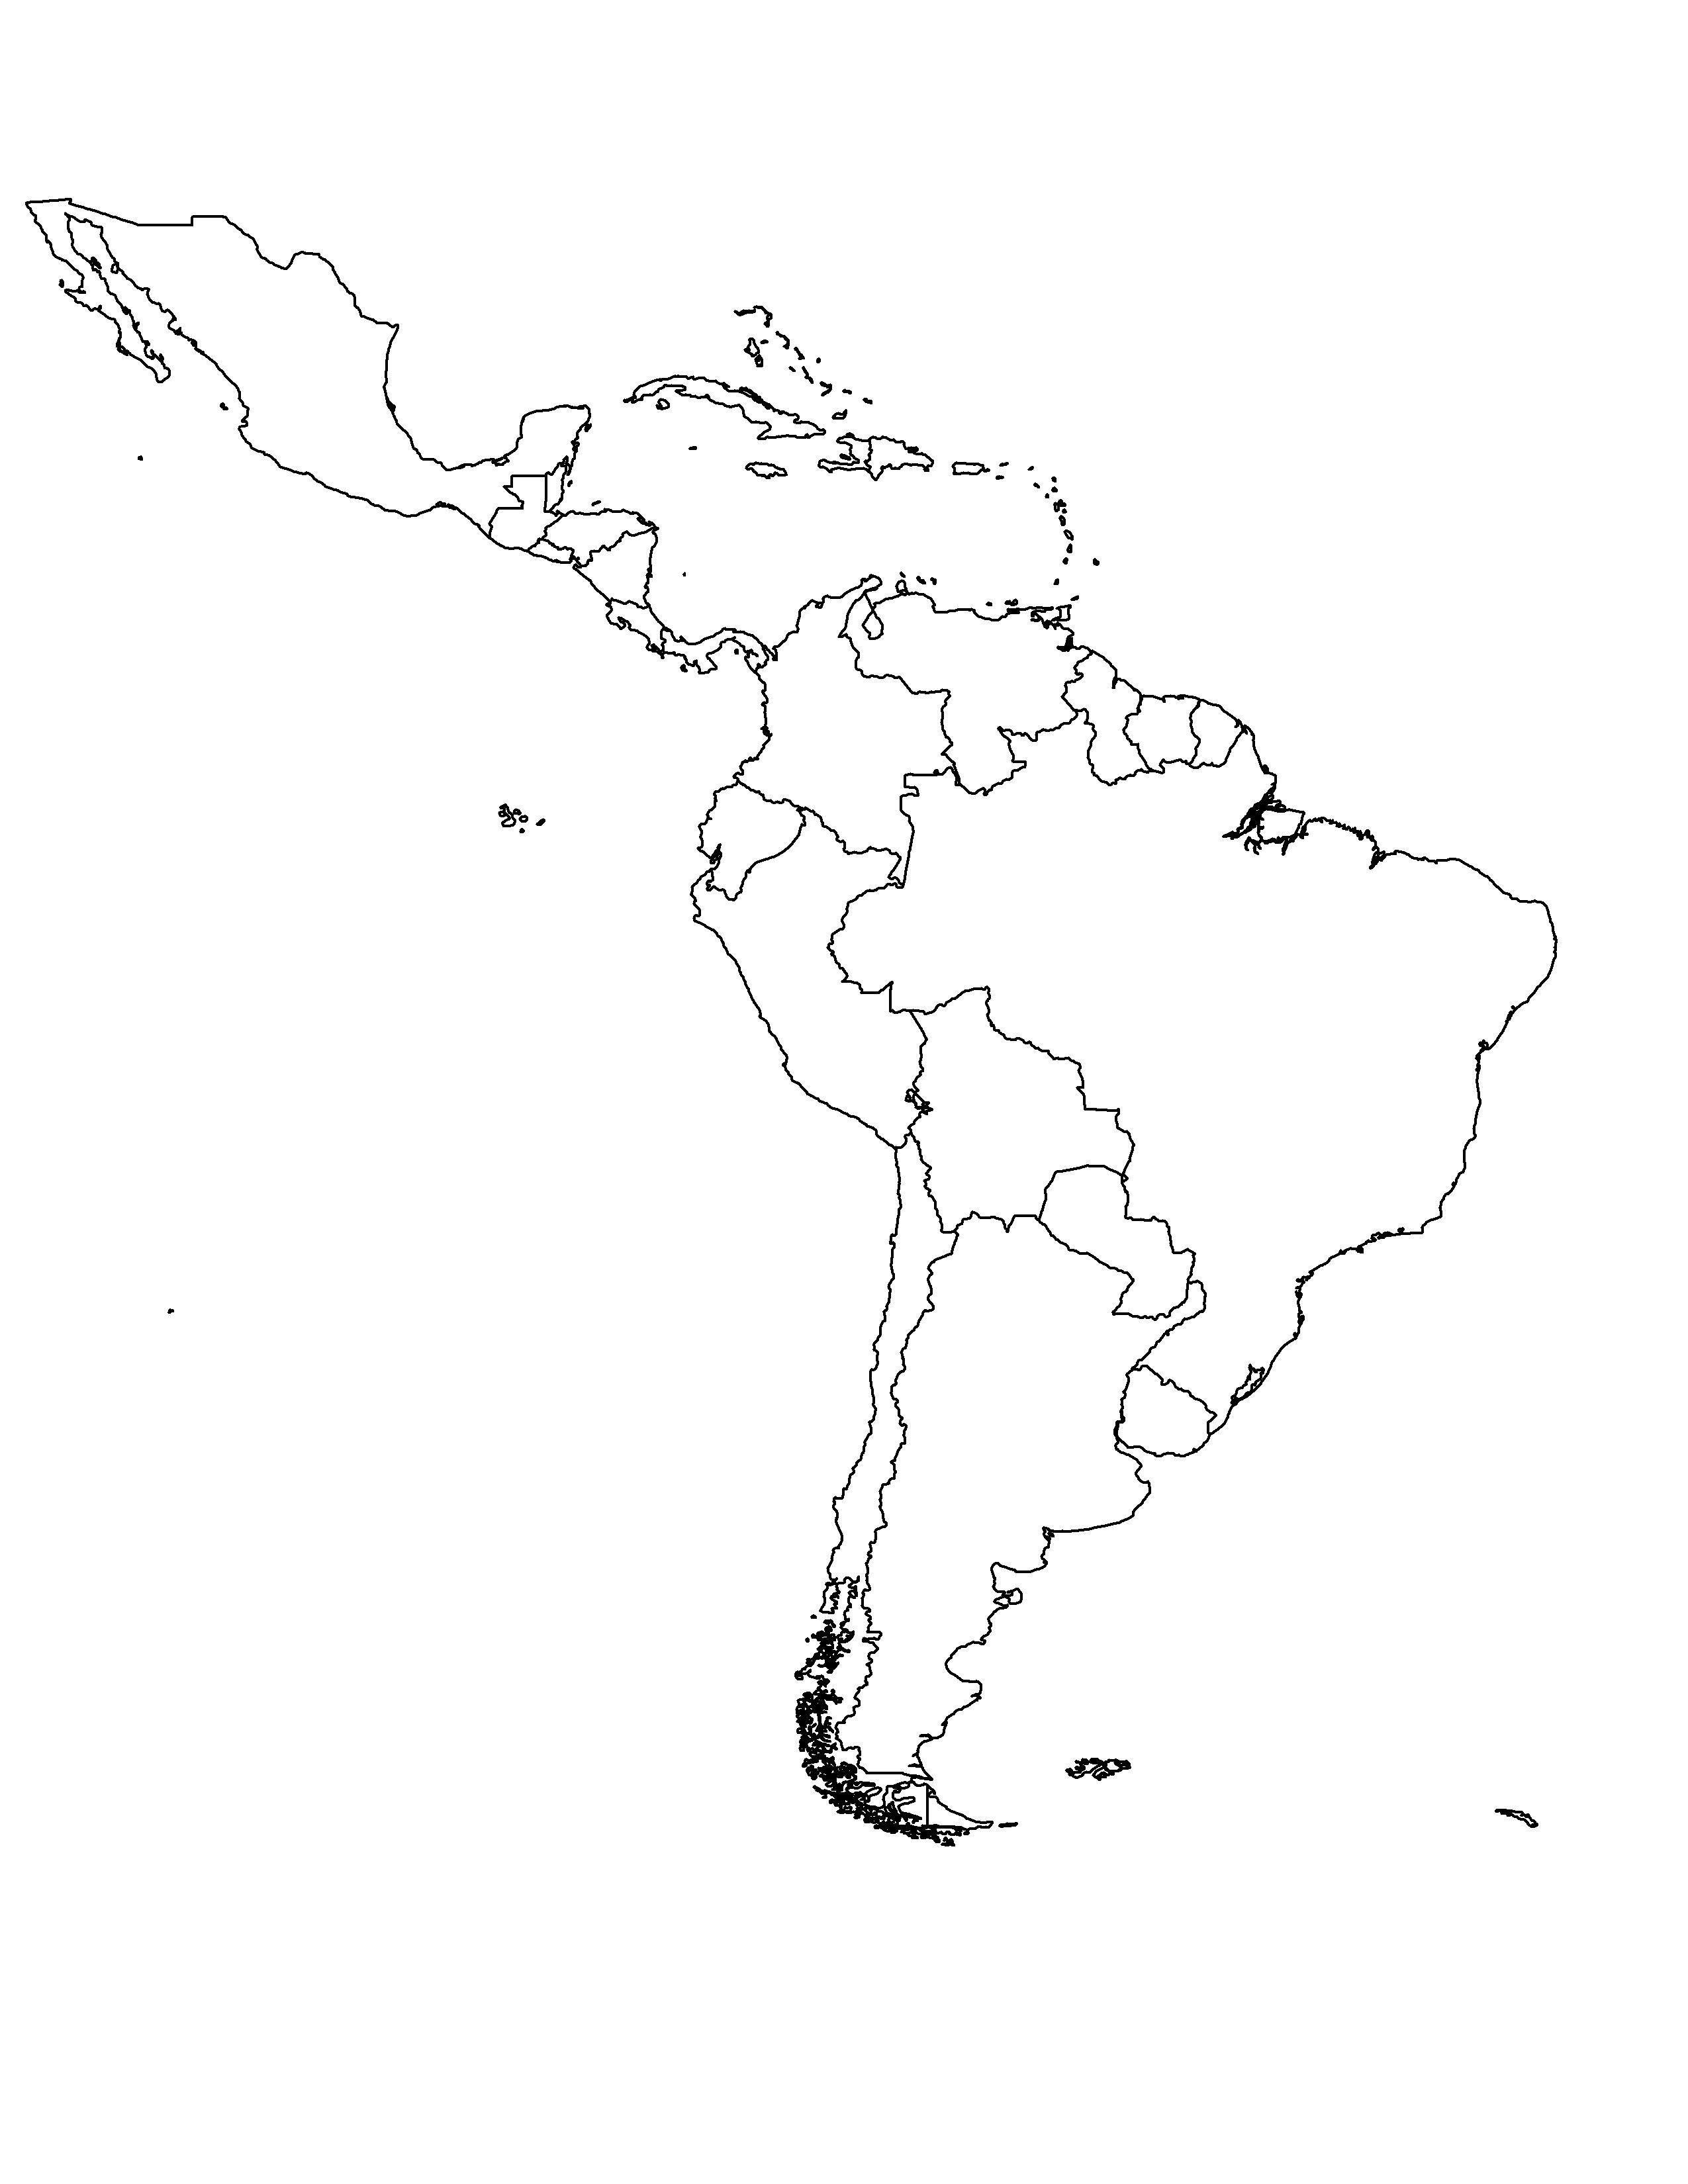 Latin America Blank Map | Ageorgio - Blank Map Of Latin America Printable